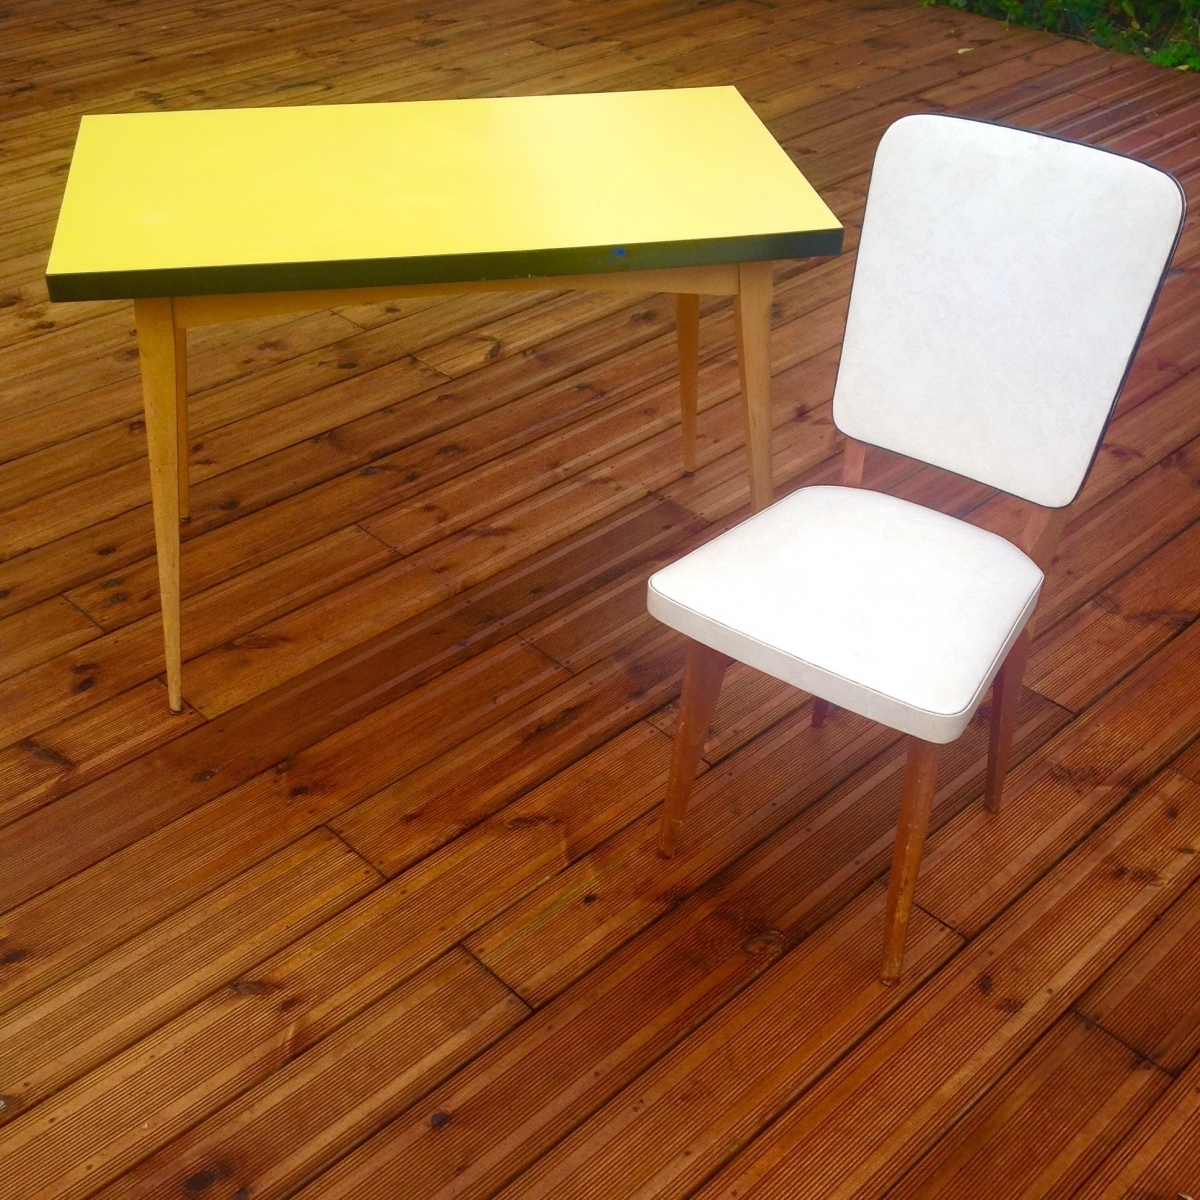 table vintage scandinave pas cher en formica jaune avec pieds compas luckyfind. Black Bedroom Furniture Sets. Home Design Ideas